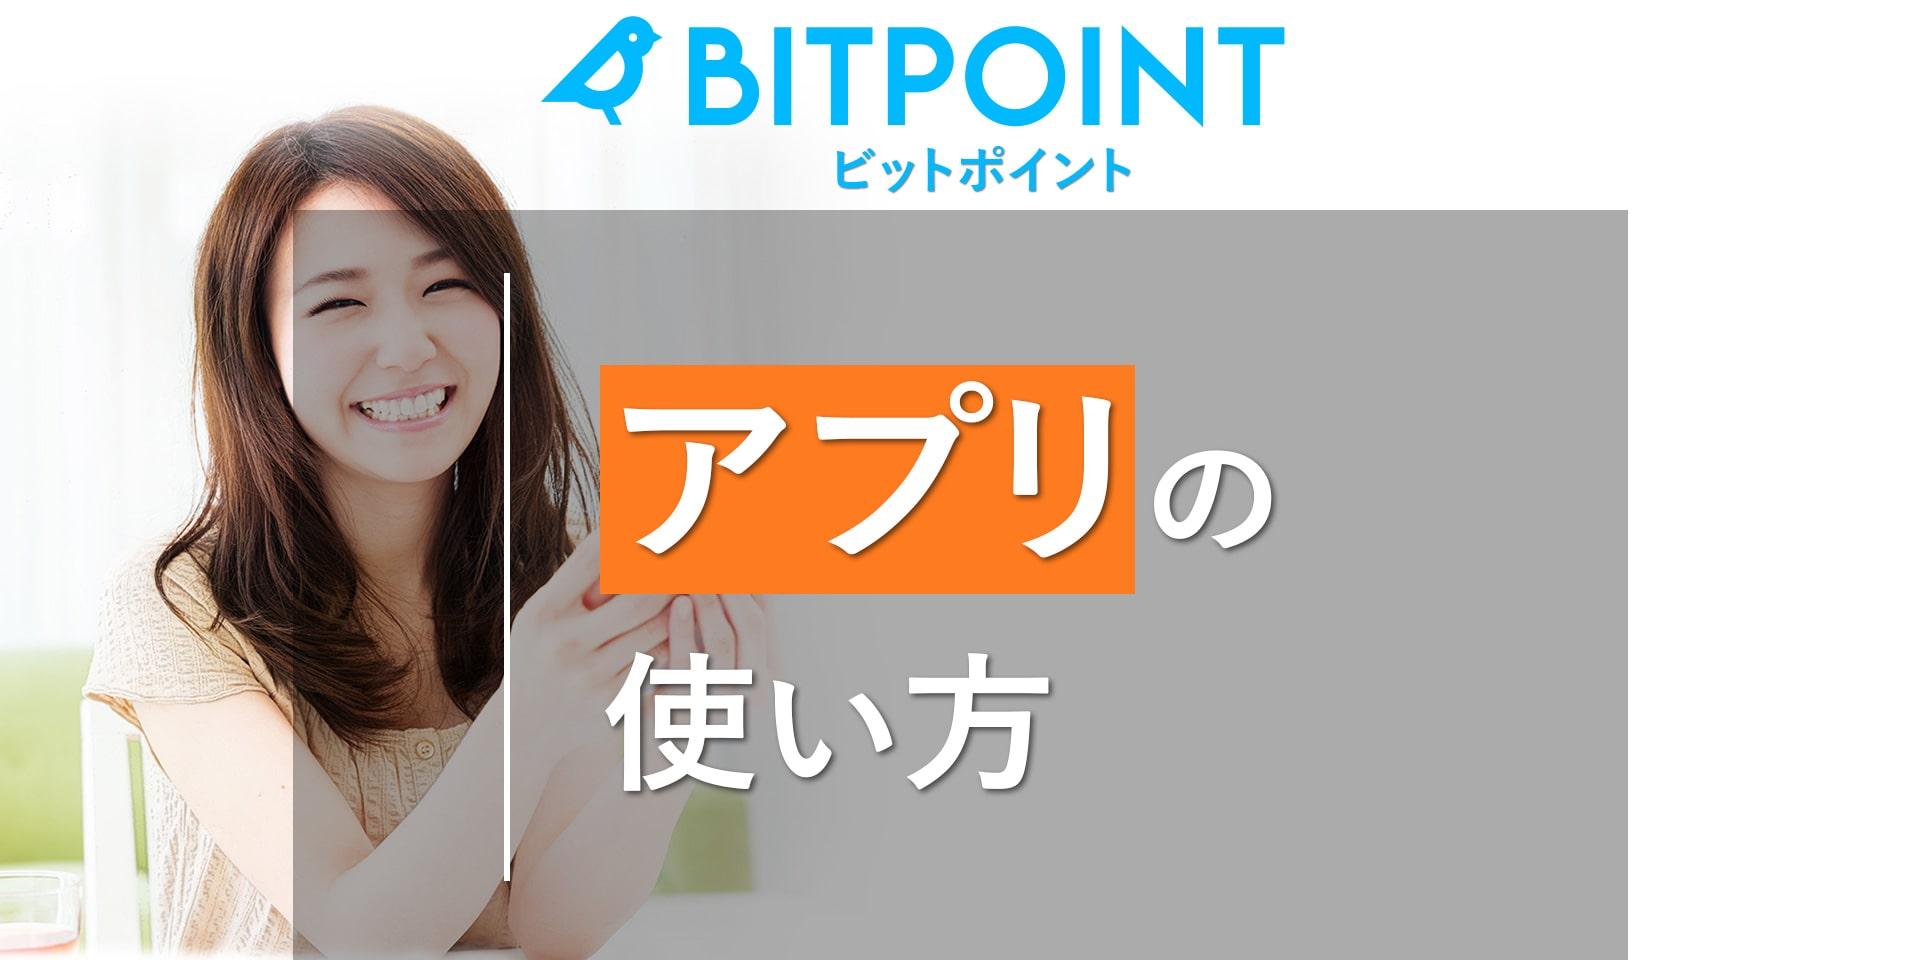 BITPoint(ビットポイント)の使い方(アプリ・買い方)を徹底解説